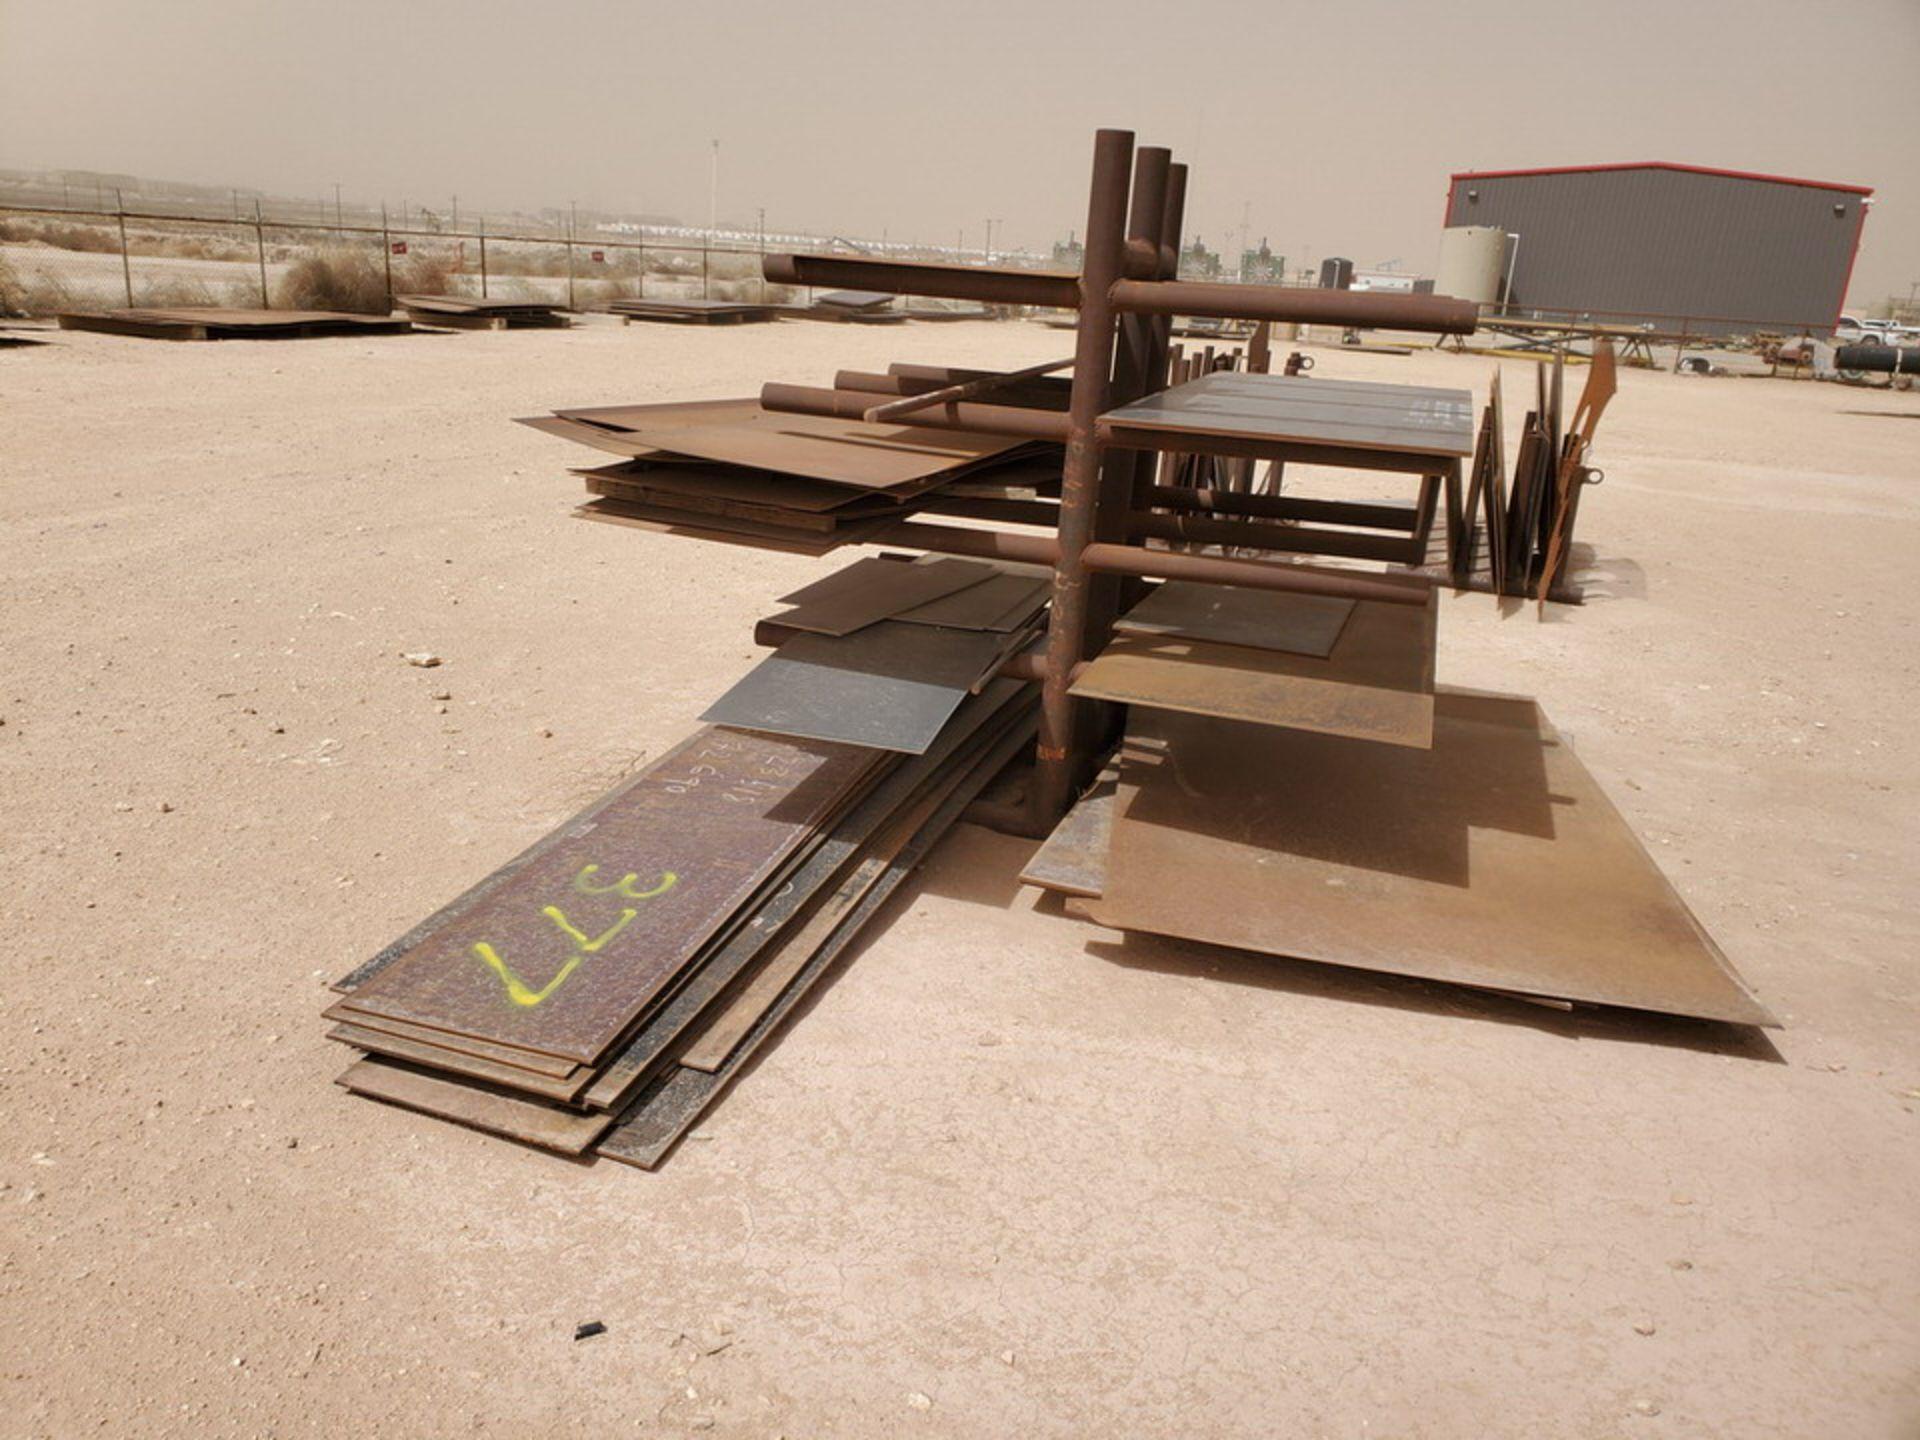 "Flat Bar & Metal Sheets L: 3' - 15', W: 1' - 5'7-1/2"", Thk: 3/16"" - 9/16""; W/ Racks - Image 4 of 12"